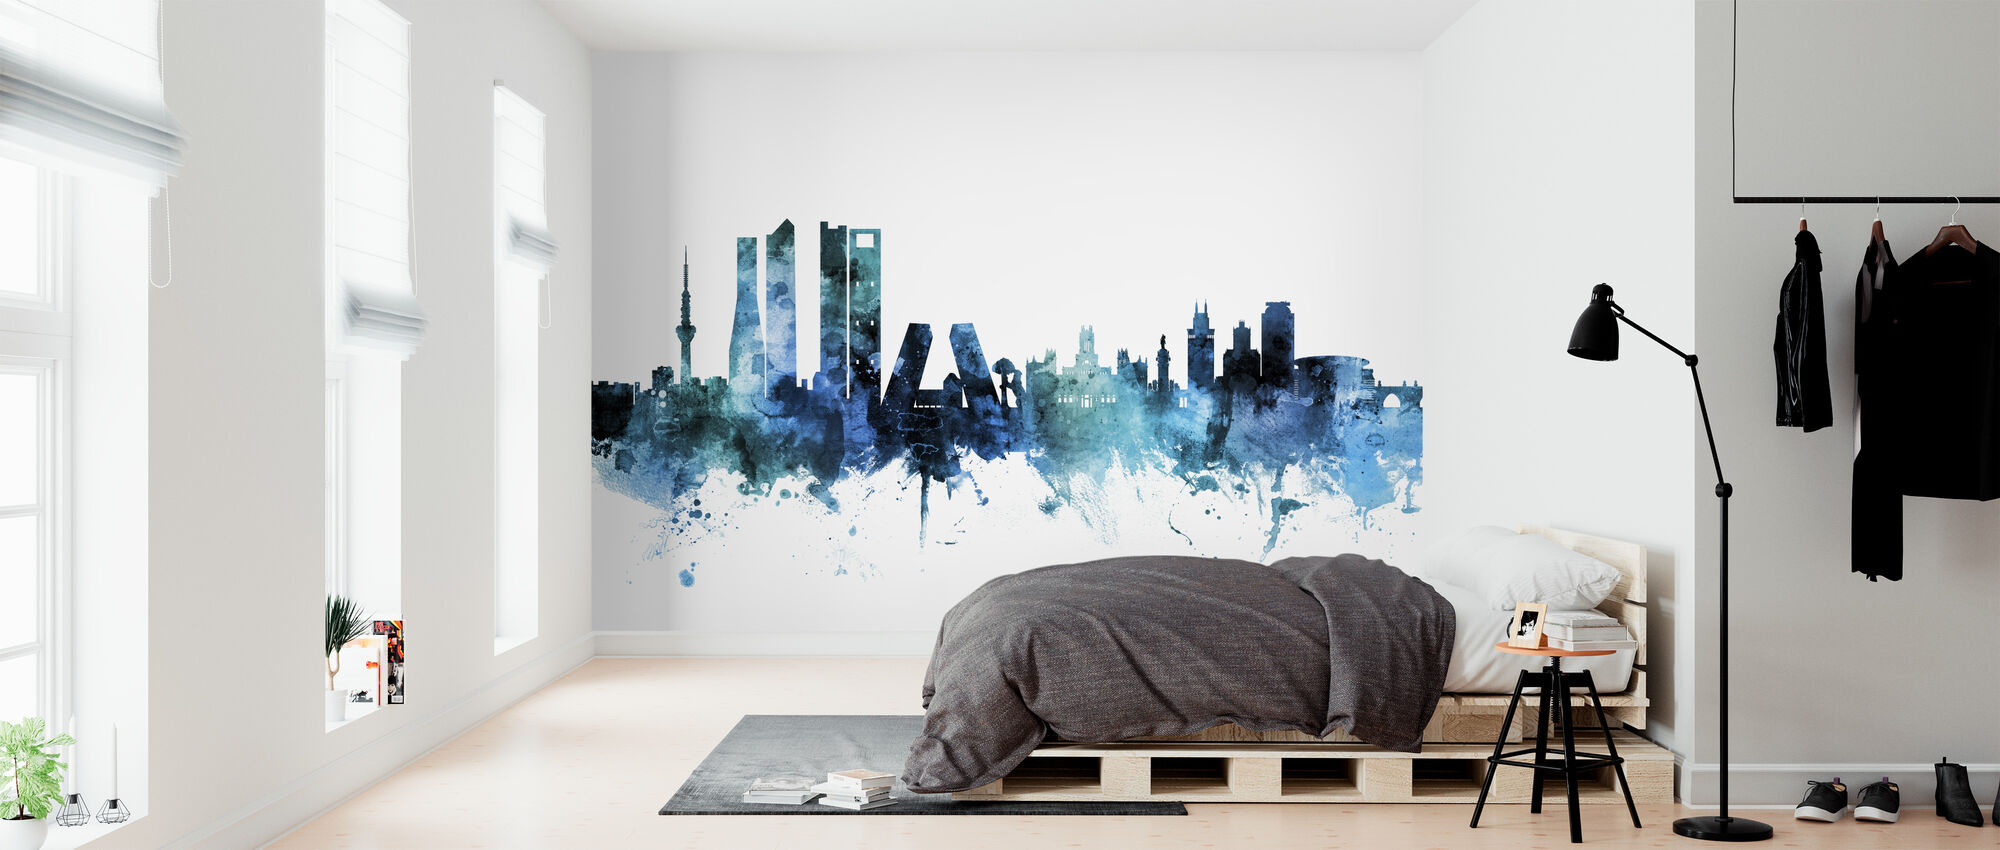 Madrid Spain Skyline - Wallpaper - Bedroom